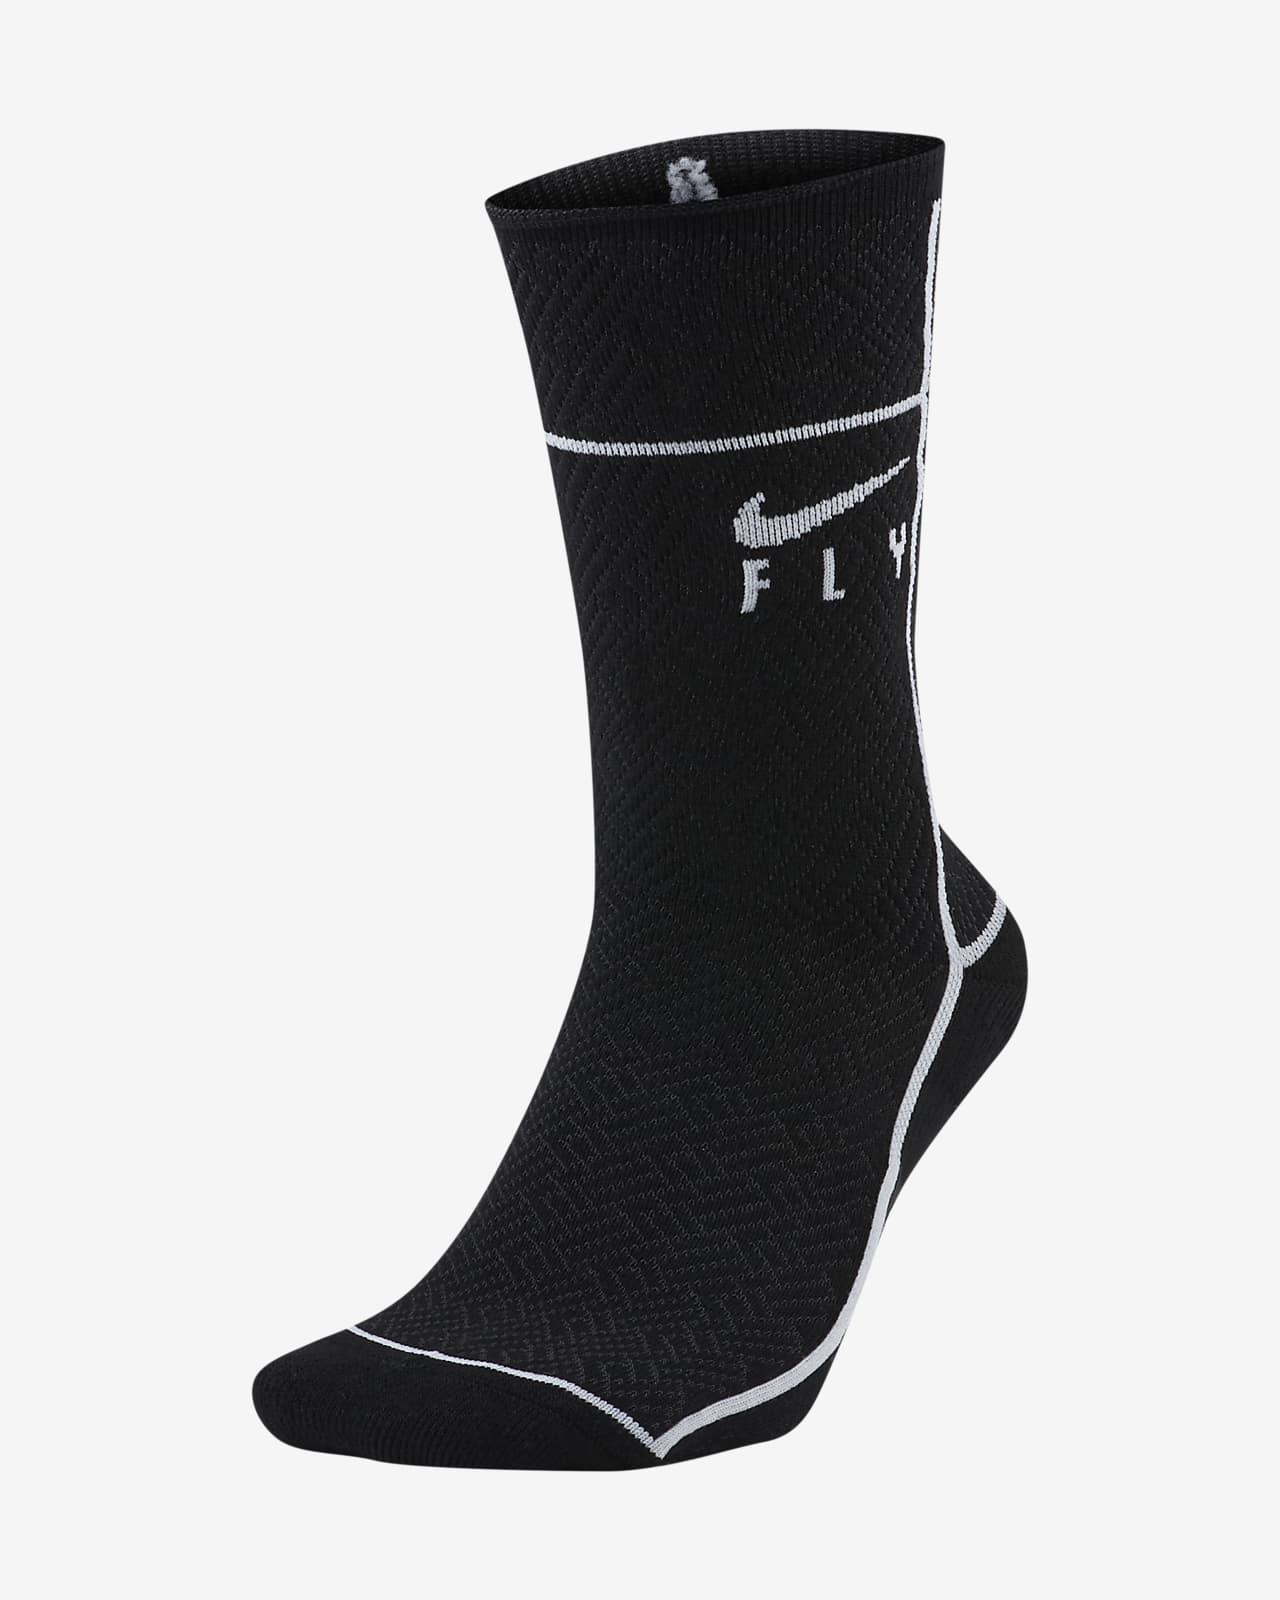 Chaussettes de basketball mi-mollet Nike SNKR SOX Swoosh Fly